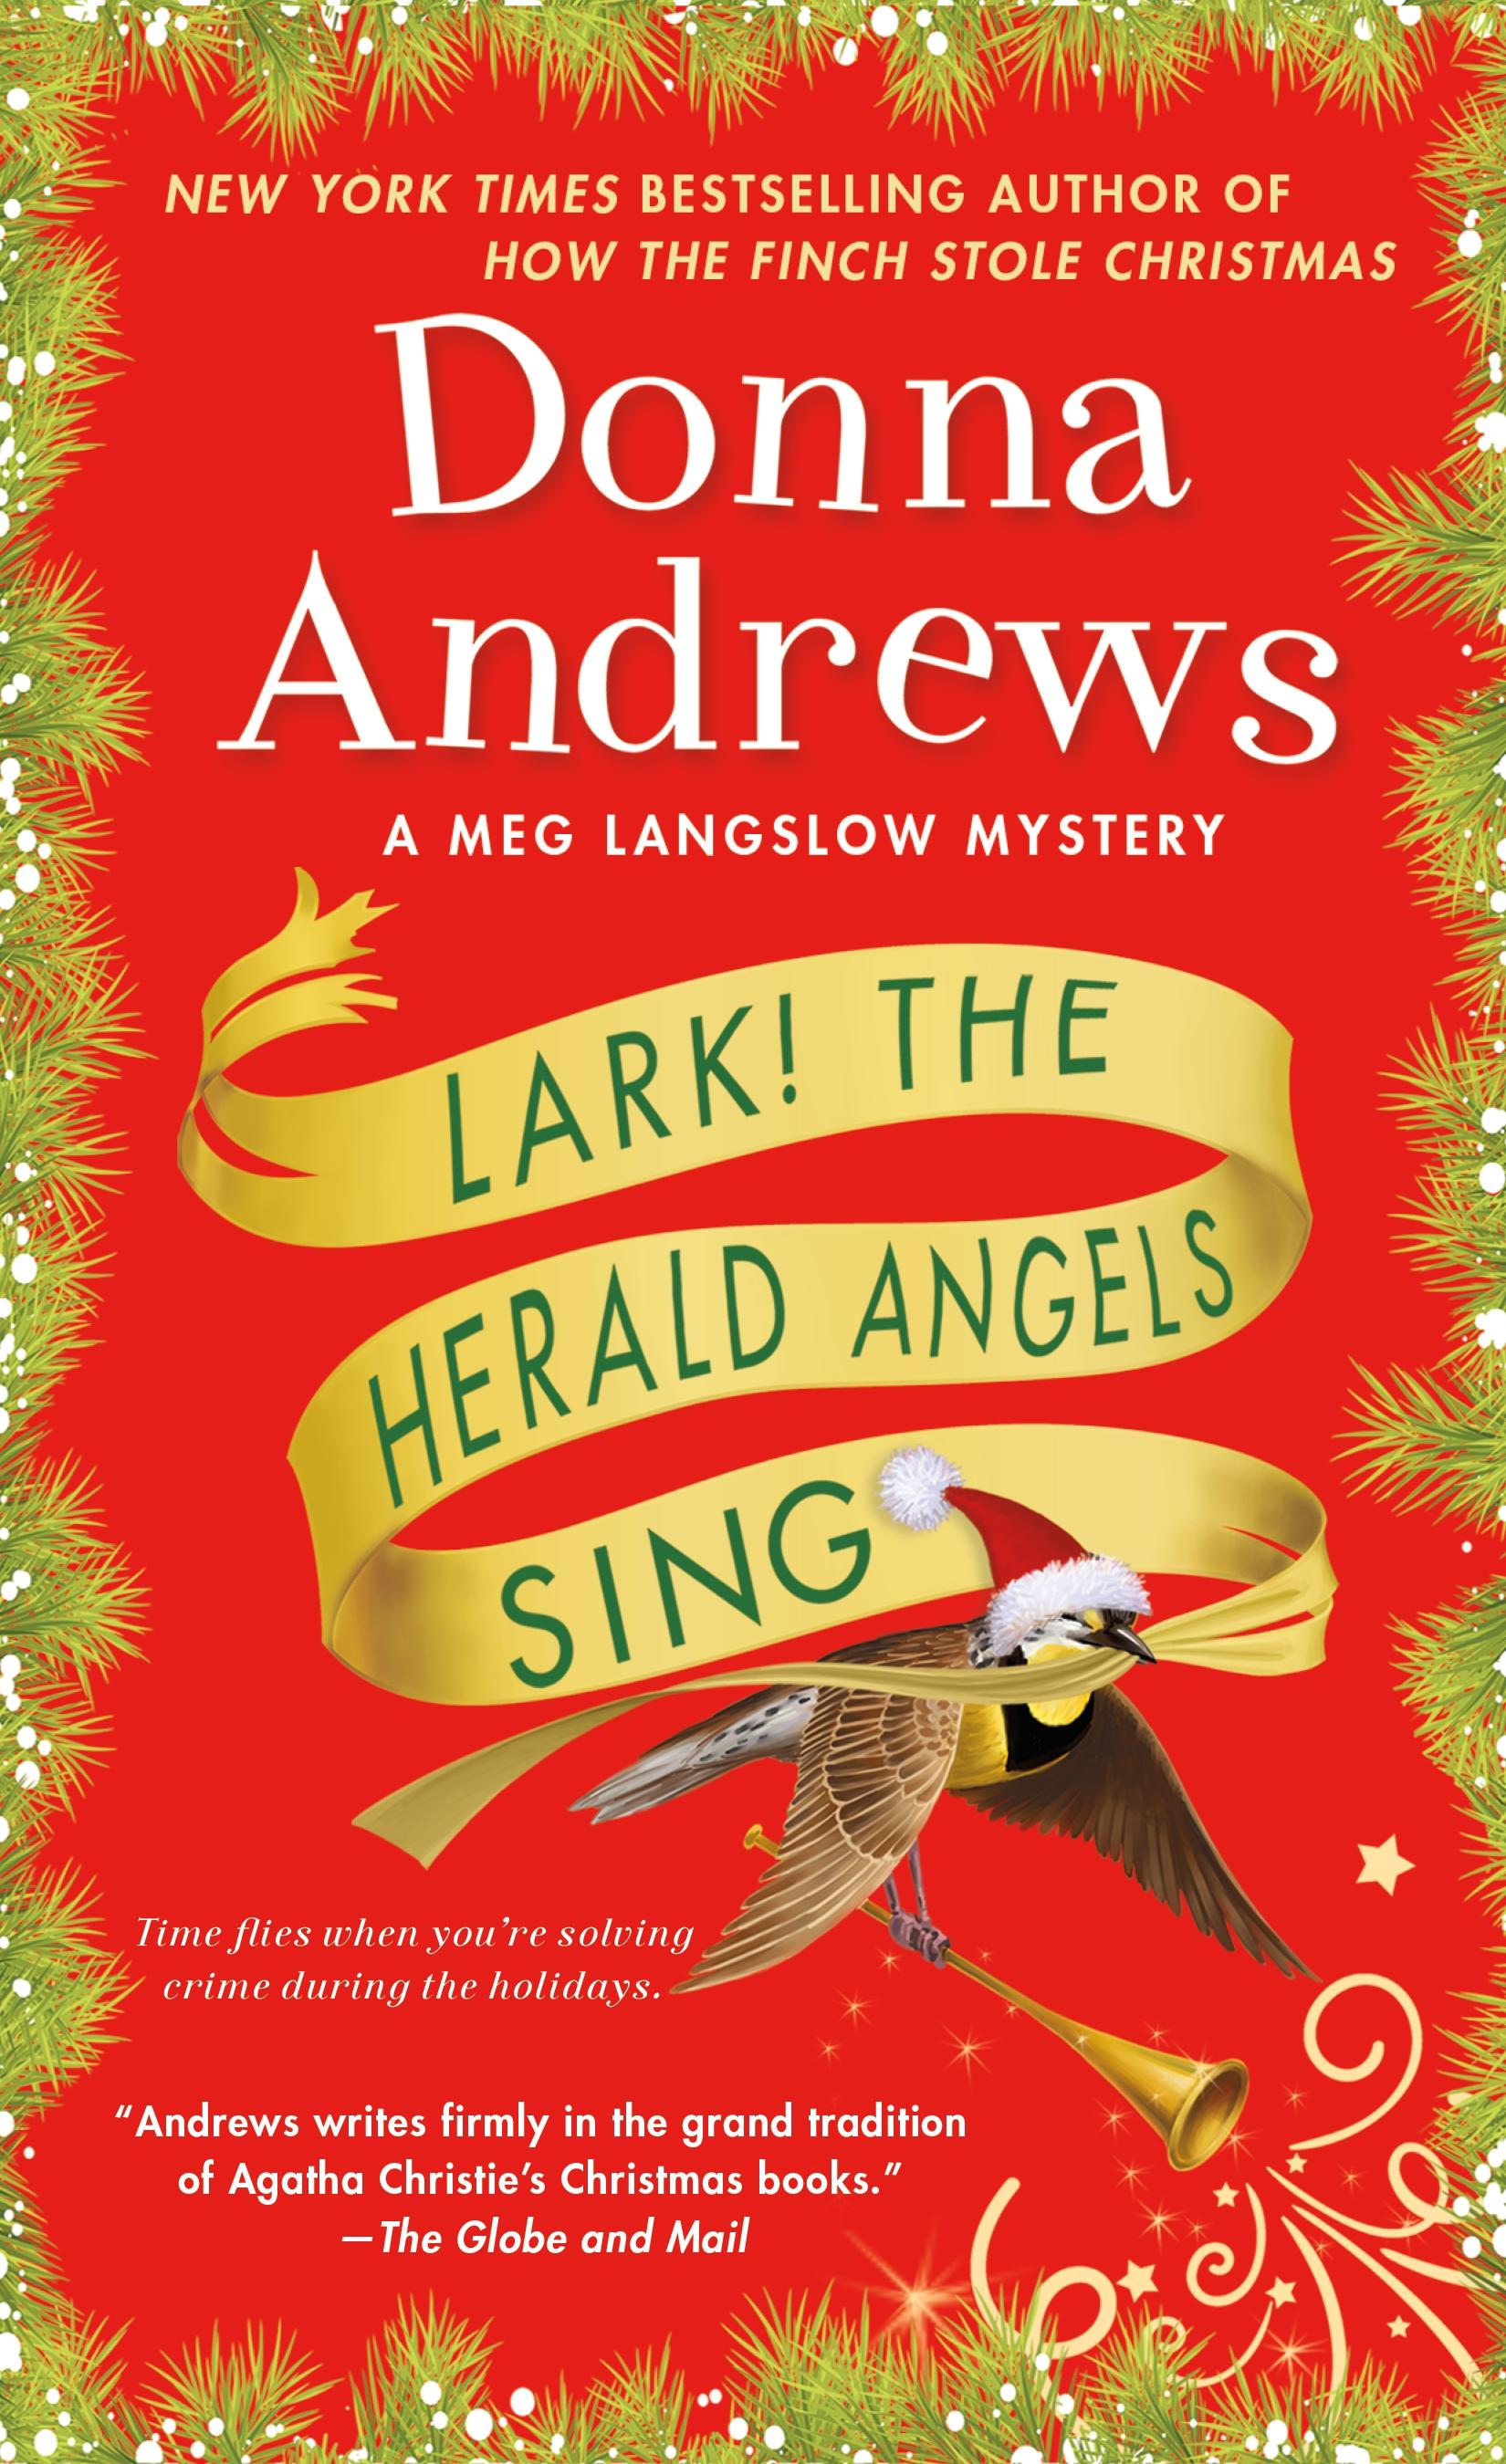 Lark! The Herald Angels Sing A Meg Langslow Mystery